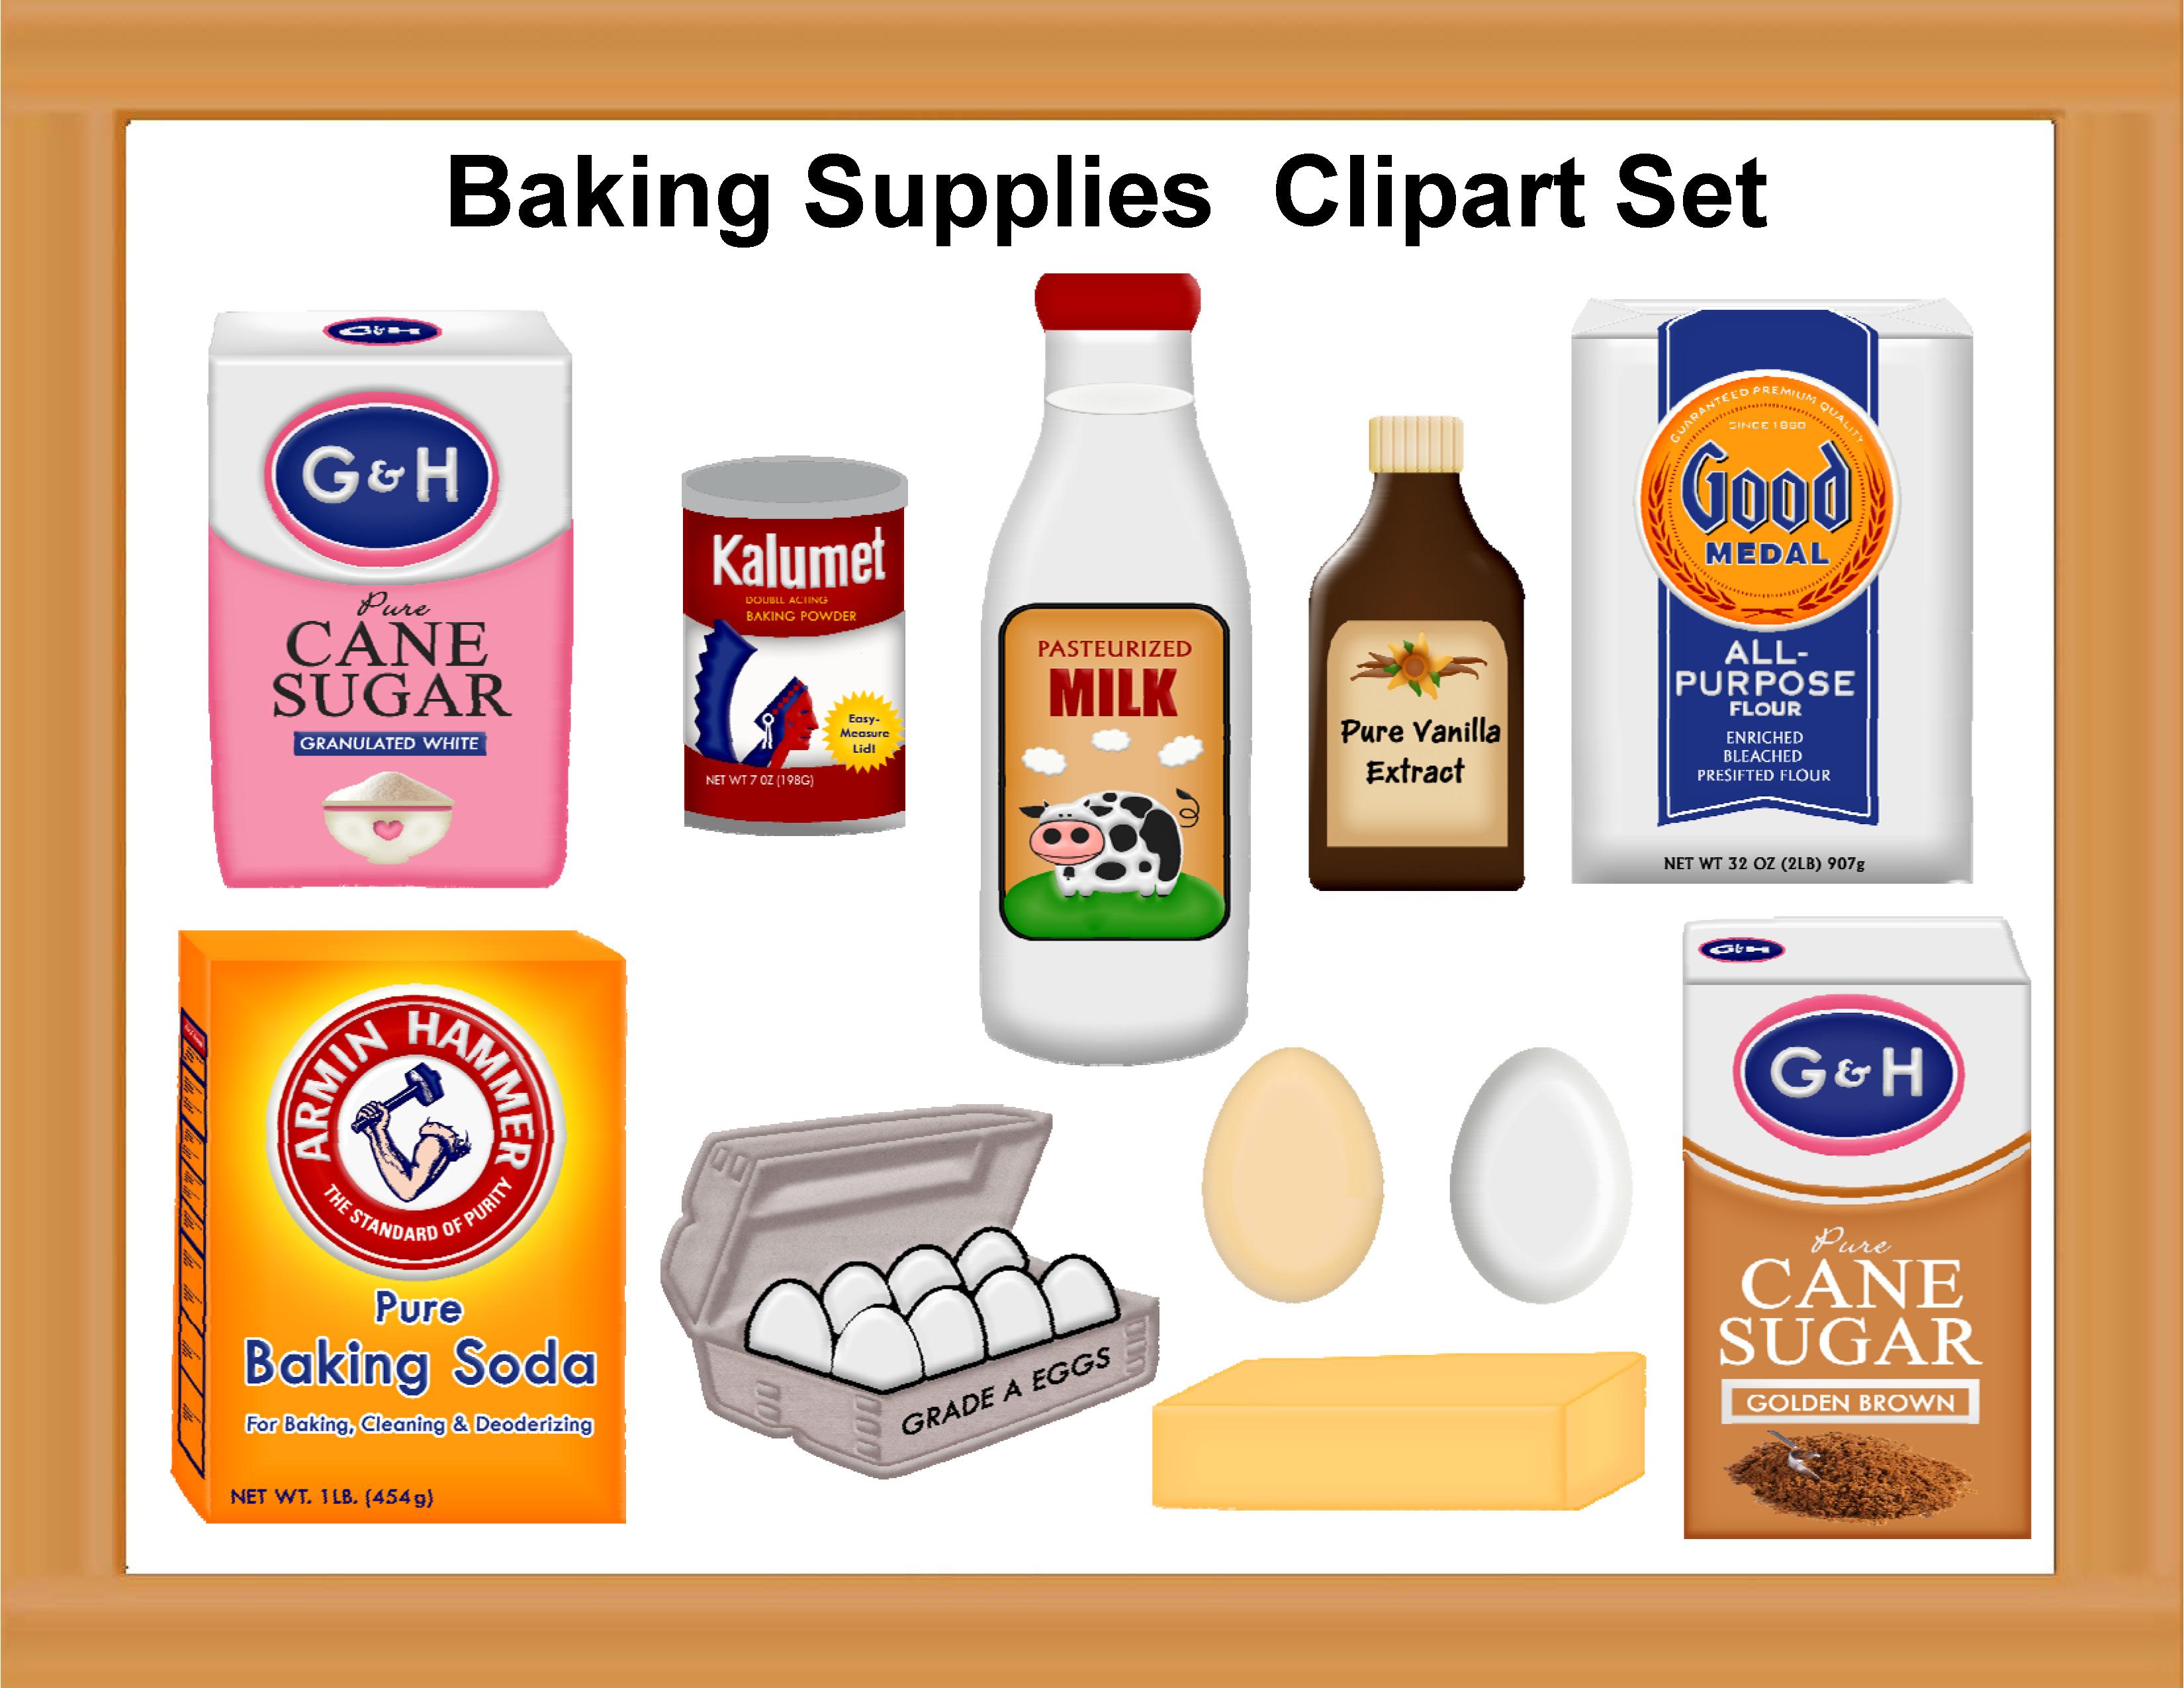 Baking Equipment Clipart - Clipart Suggest